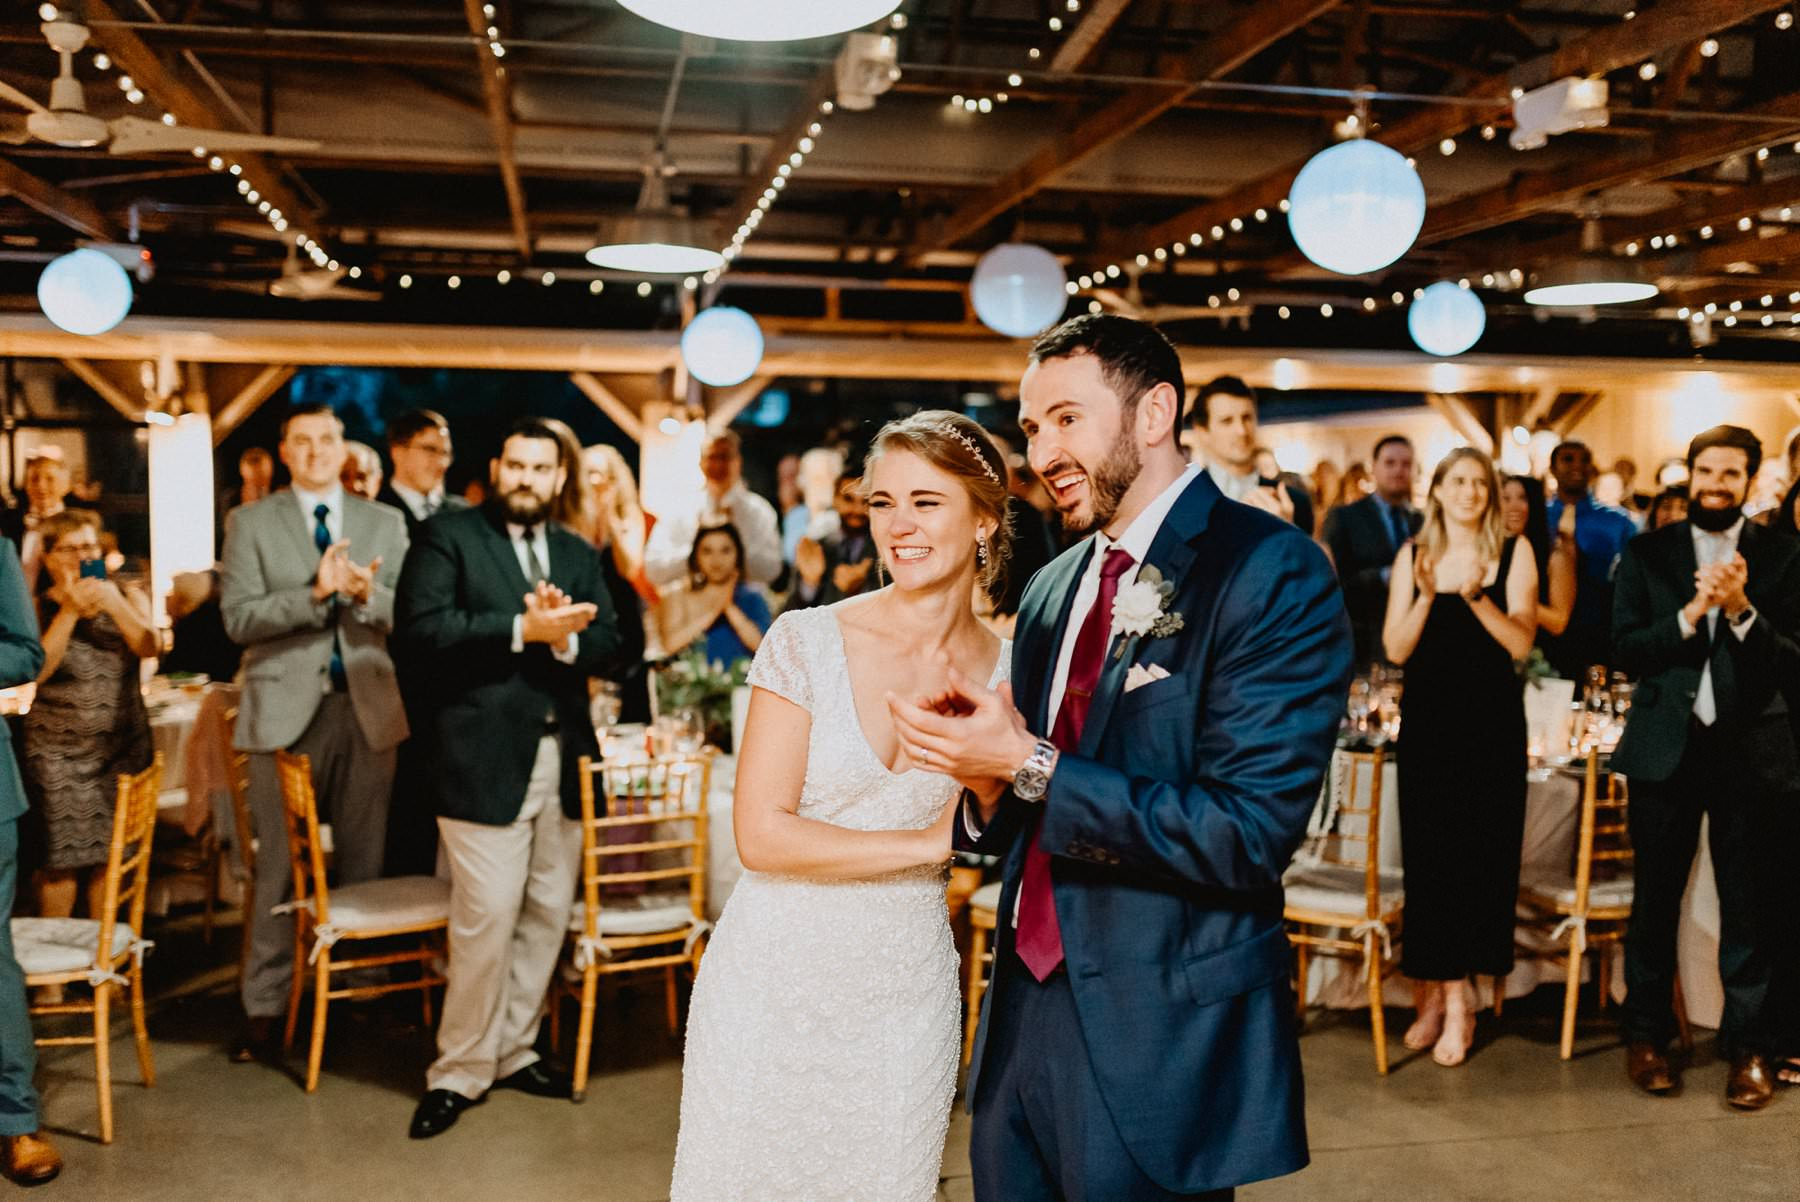 John_James_Audubon_Center_wedding-73.jpg